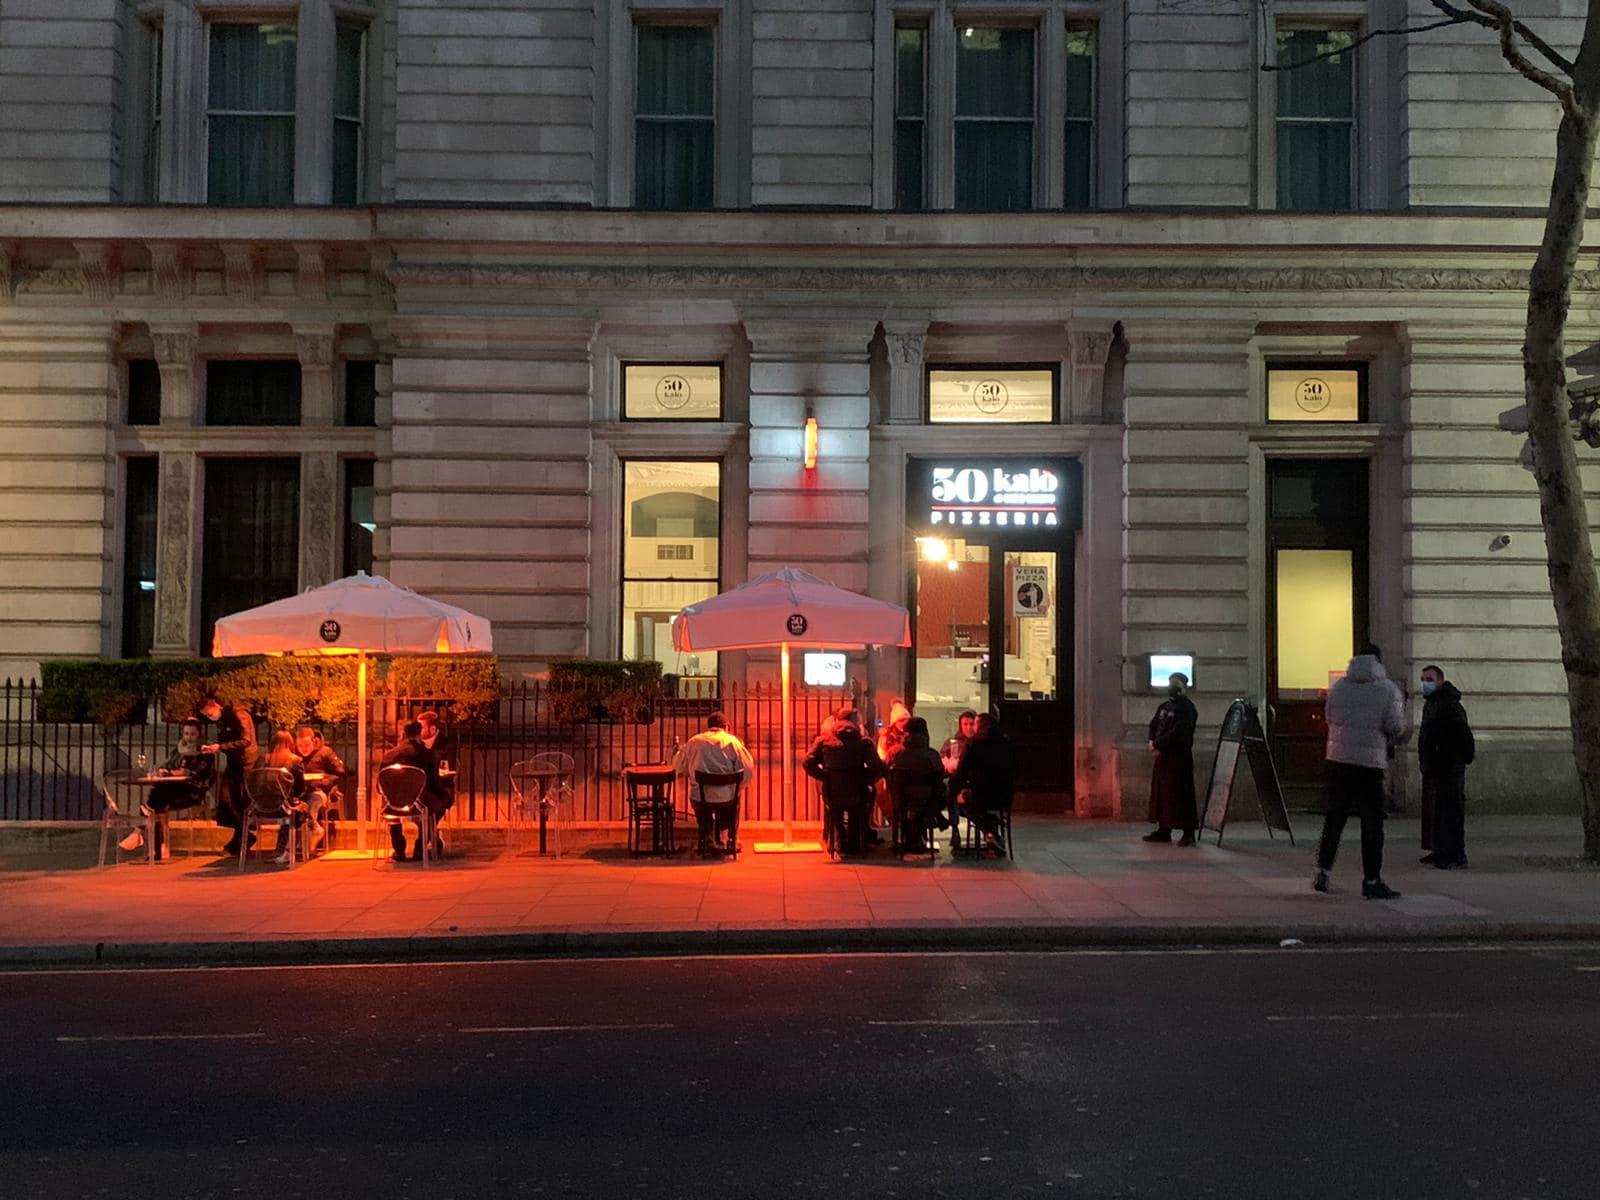 50 Kalò a Londra, dehors